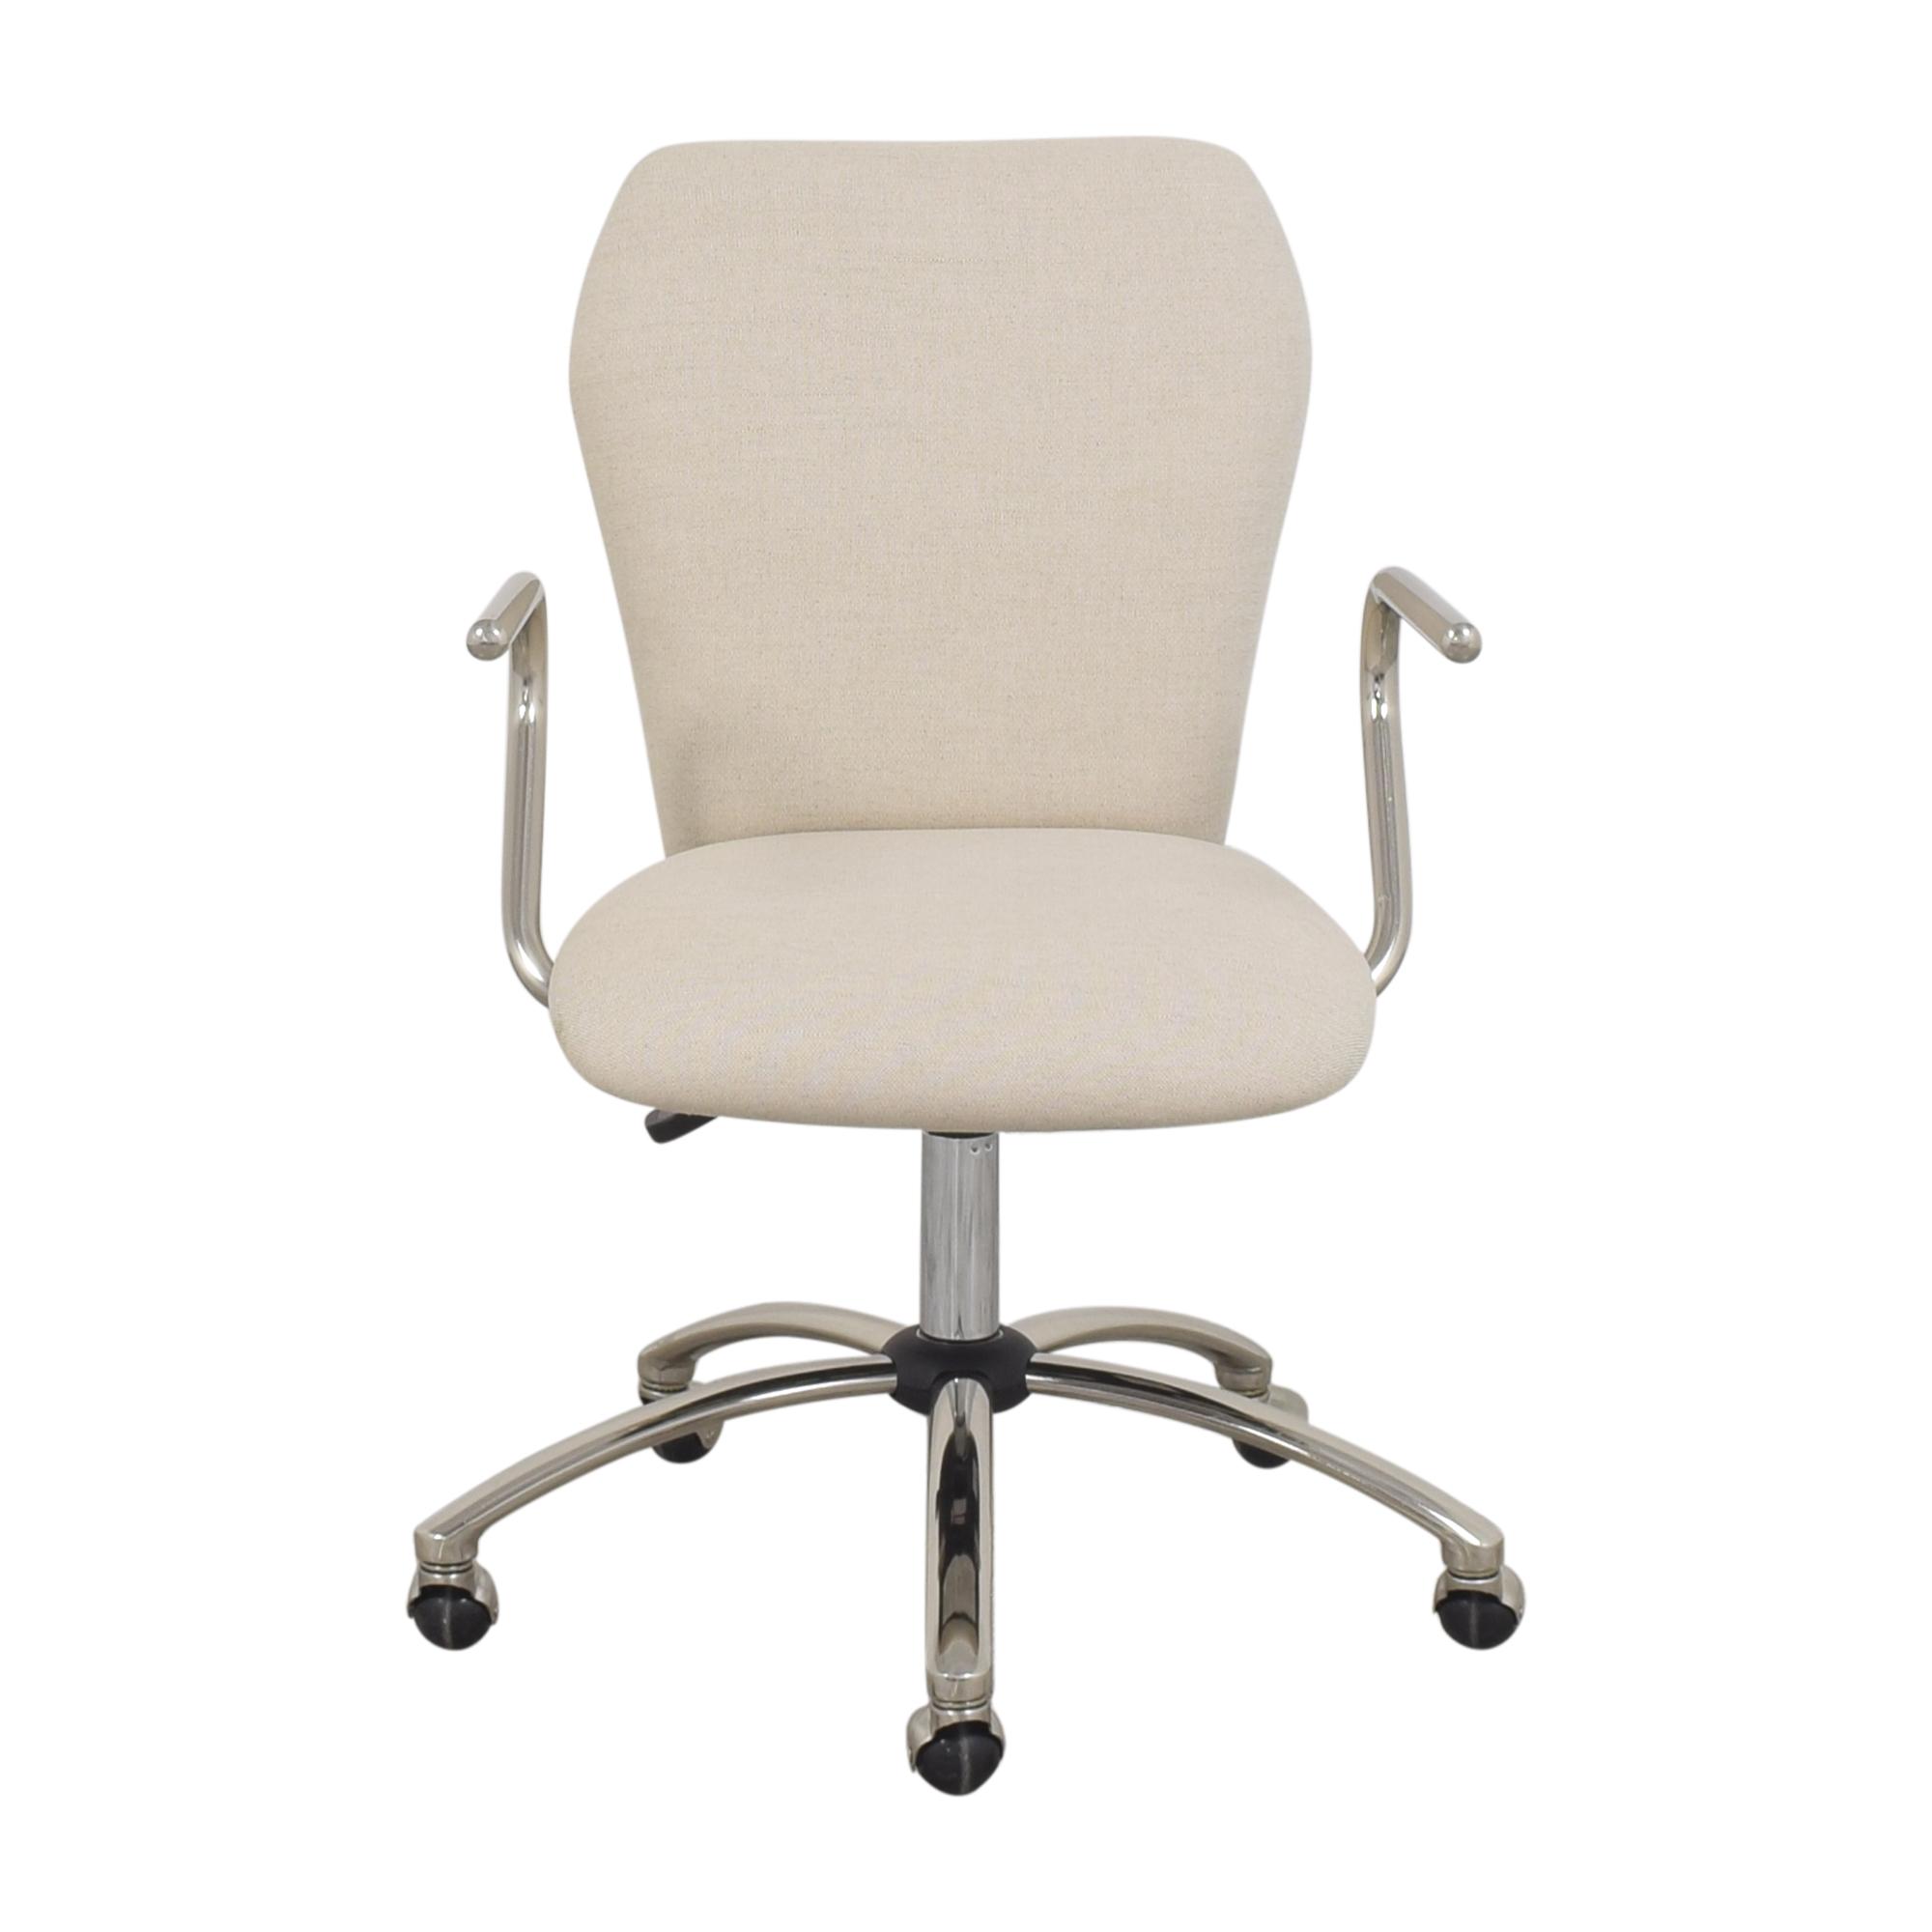 buy Pottery Barn Airgo Desk Chair Pottery Barn Chairs